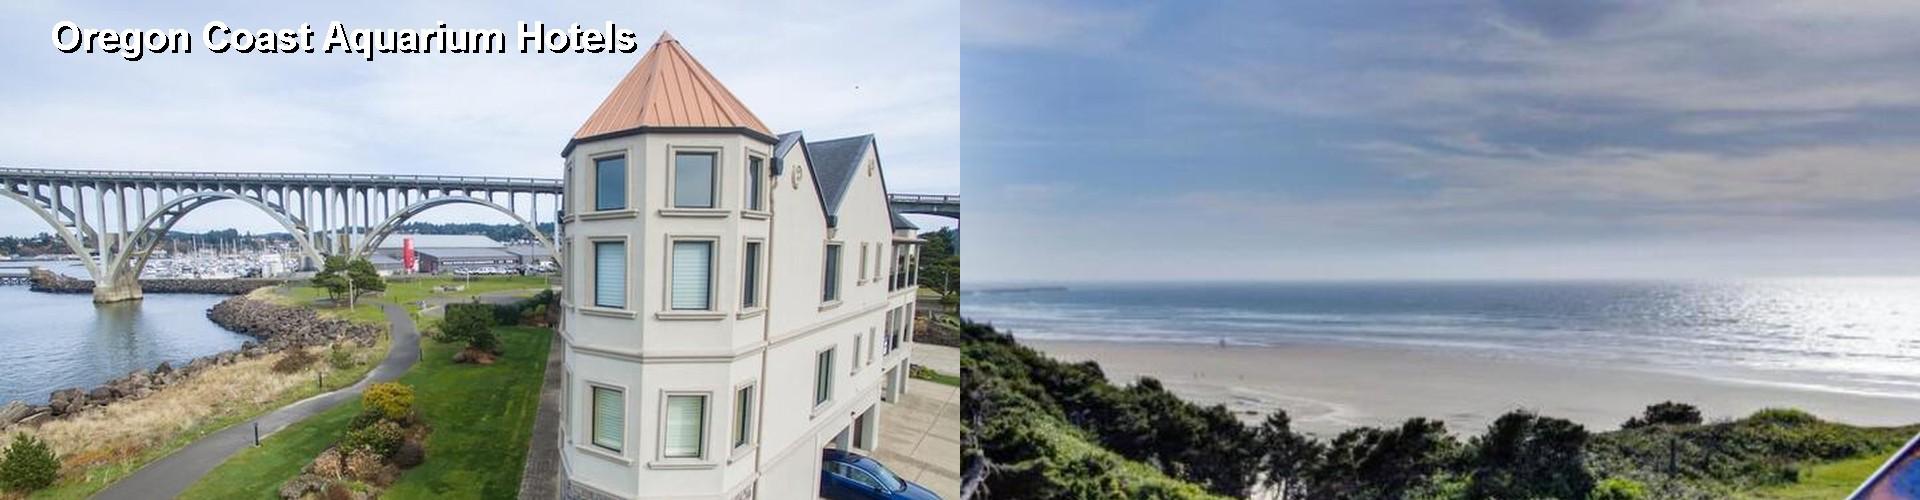 5 Best Hotels Near Oregon Coast Aquarium